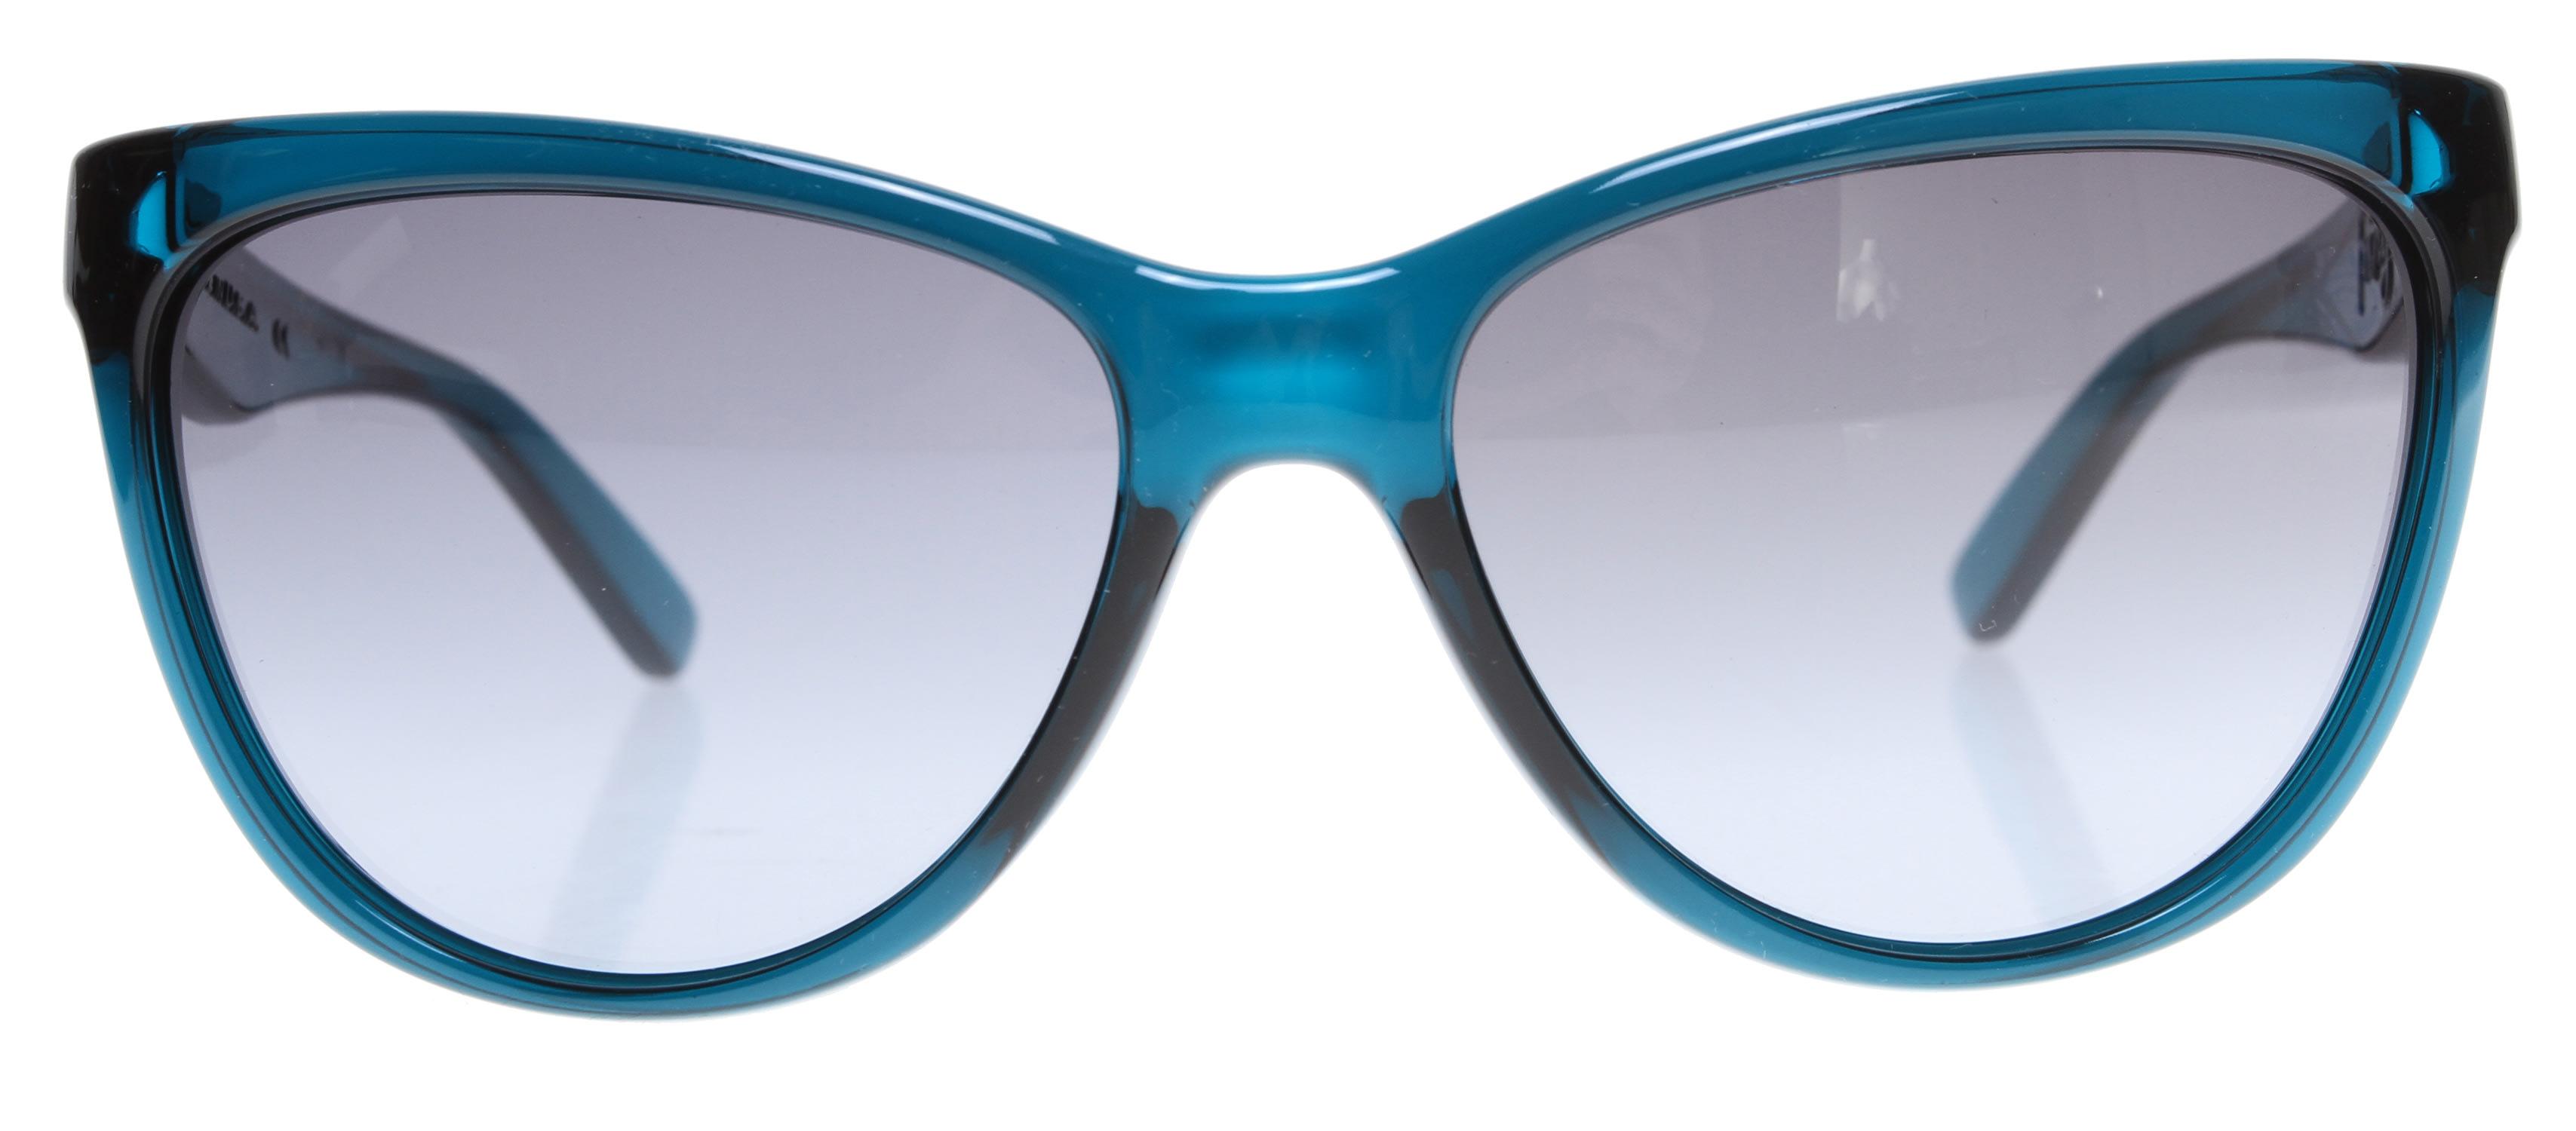 13280336ace ireland oakley mens frogskins sunglassesblack ink 033ee 1d930  switzerland  oakley fringe sunglasses thumbnail 3 a1013 8136e